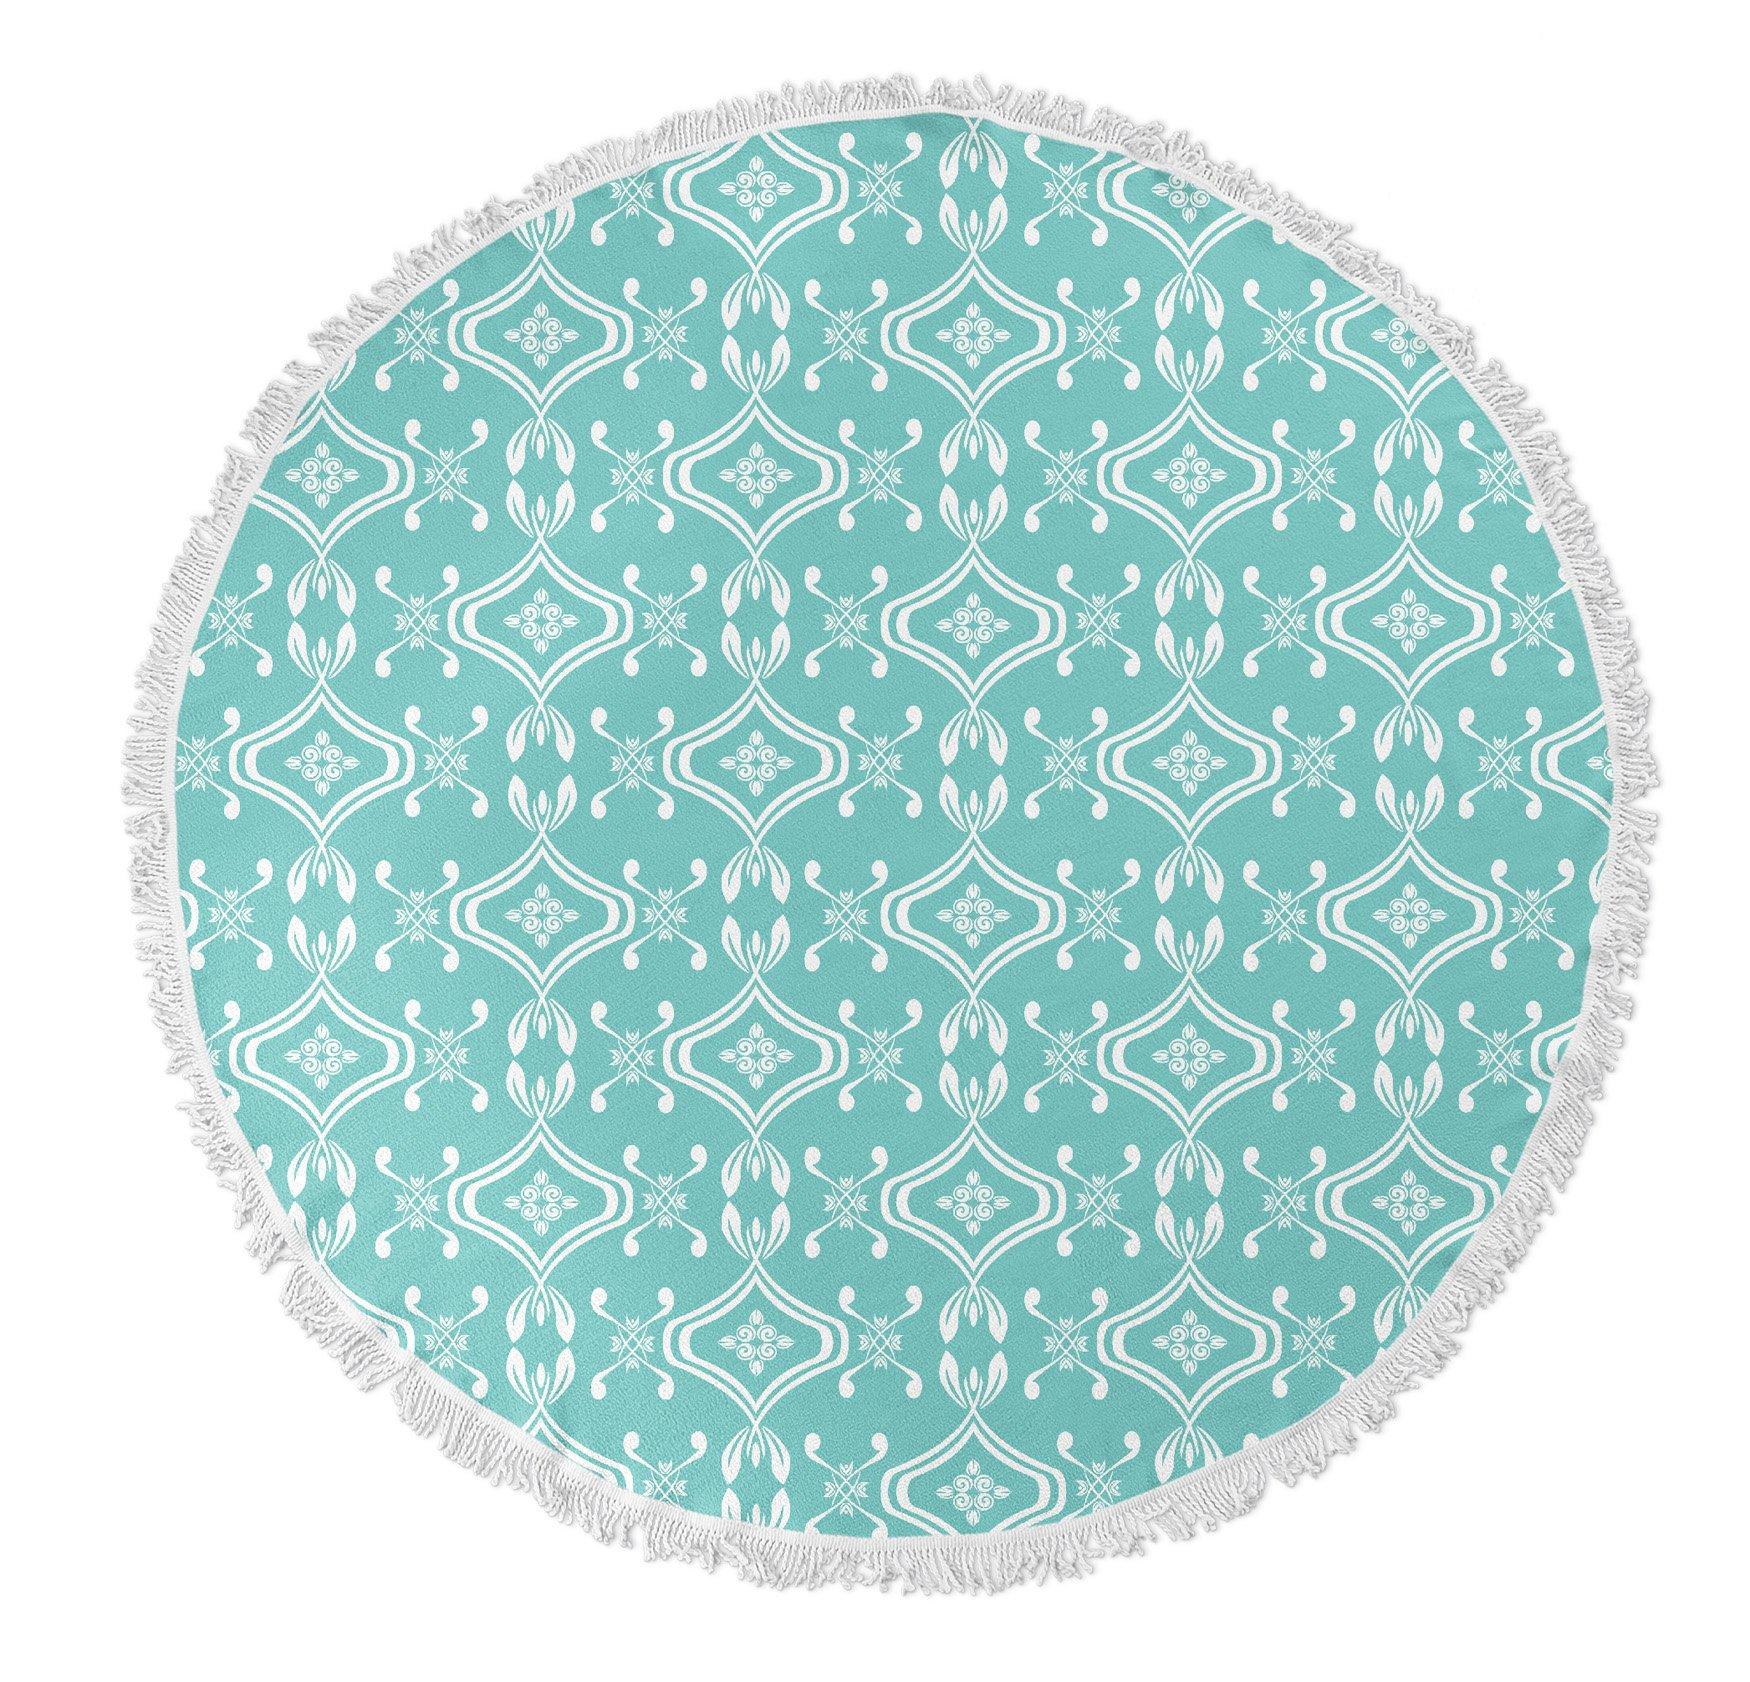 KAVKA Designs Beach Bingo Round Beach Towel, (Teal) - TRUDYBOOM Collection, Size: 60x60x.5 - (TELAVC026FSBTR60) by KAVKA DESIGNS